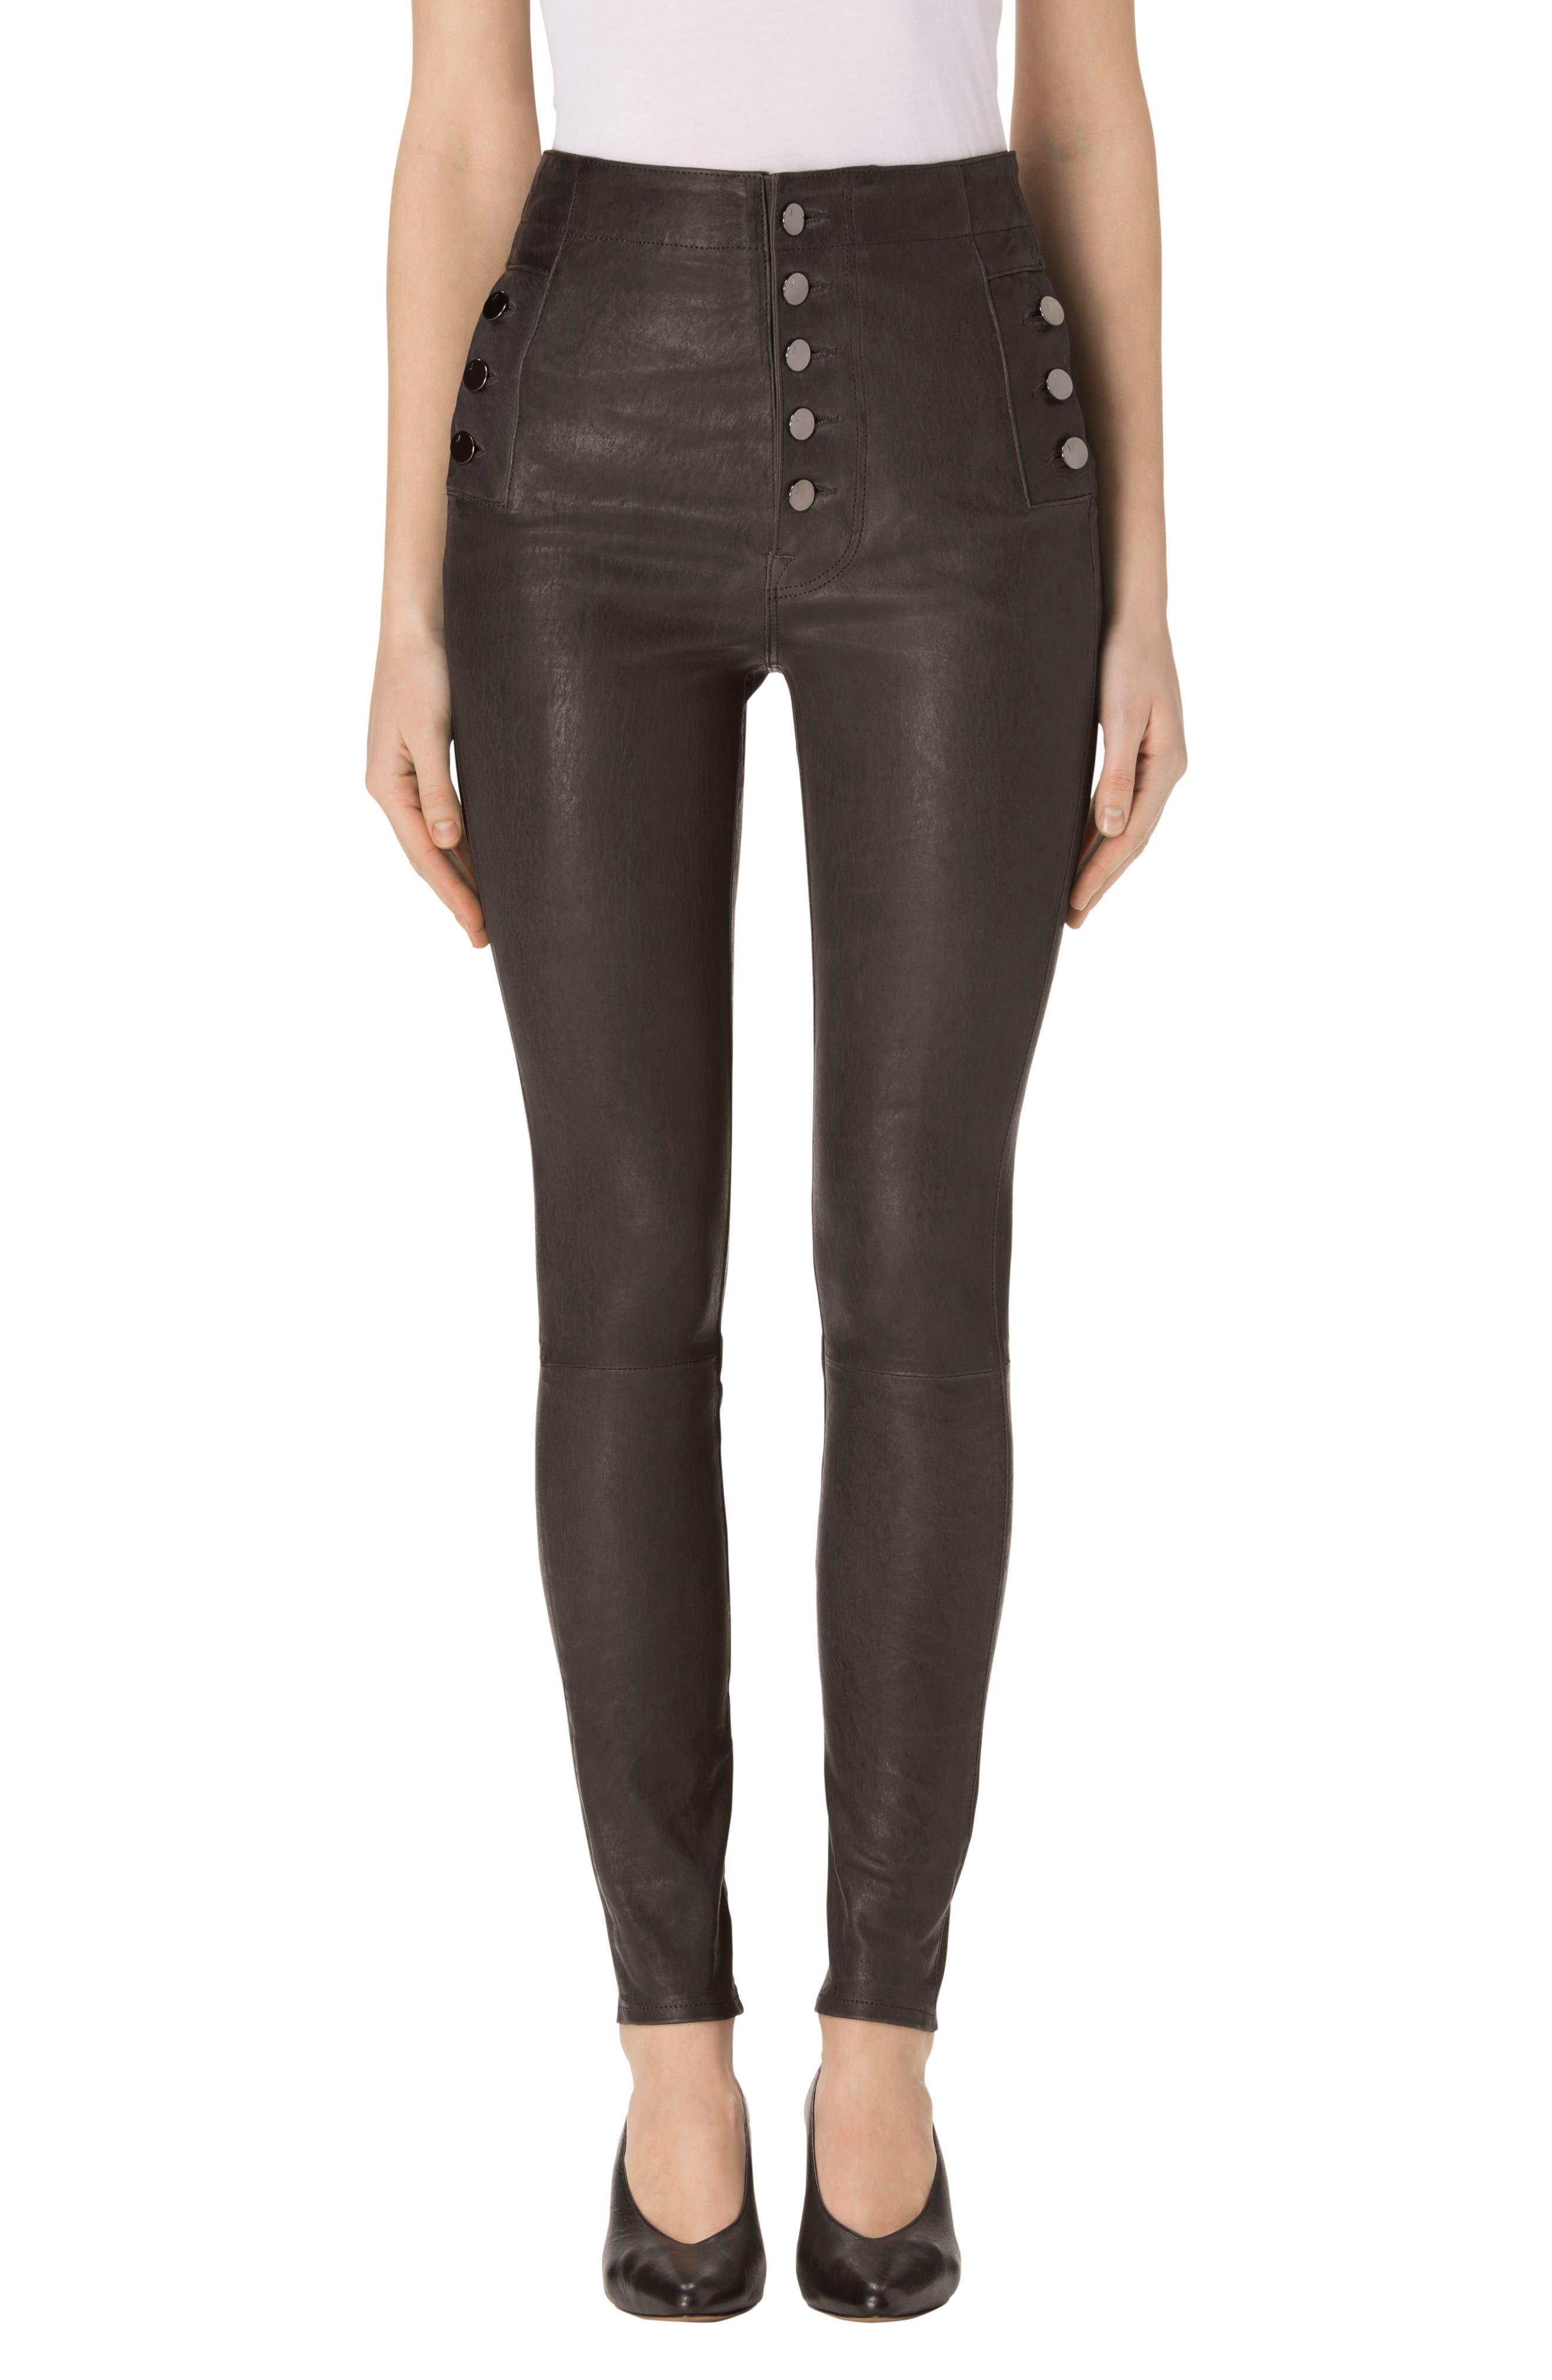 J Brand Natasha High Waist Skinny Leather Pants